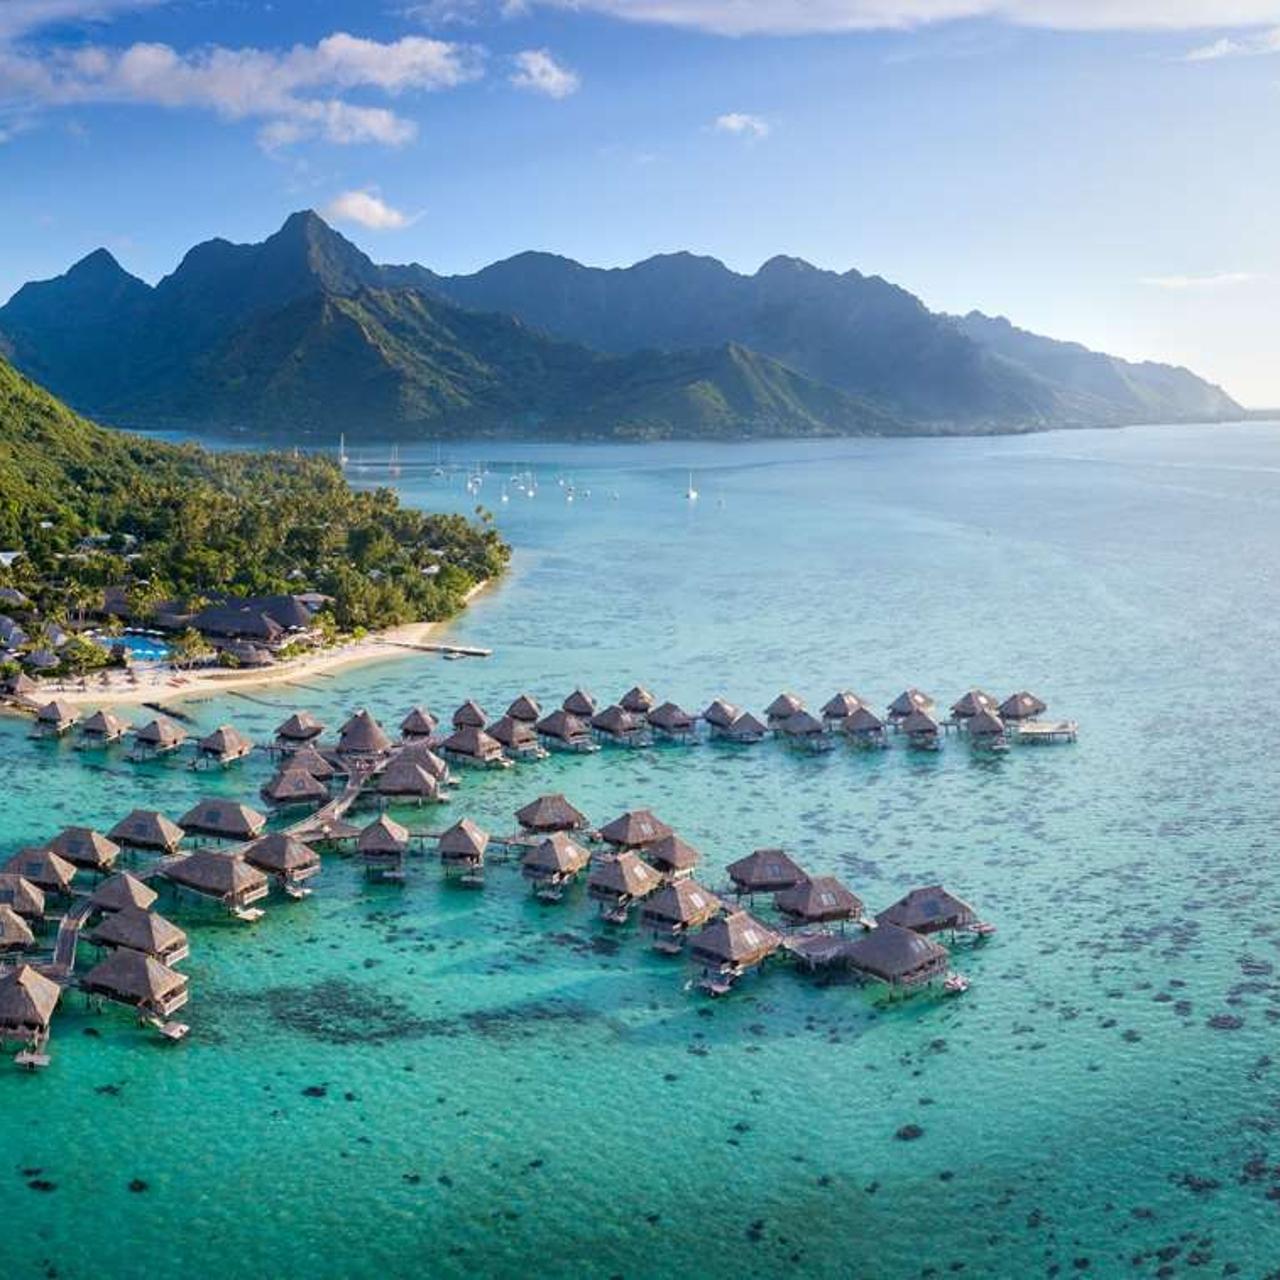 Südsee: 5* Hilton Moorea Lagoon Resort & Spa - 5 Nächte King Garten-Bungalow mit privatem Pool & div. Extras / gratis Storno / bis Mai 2022